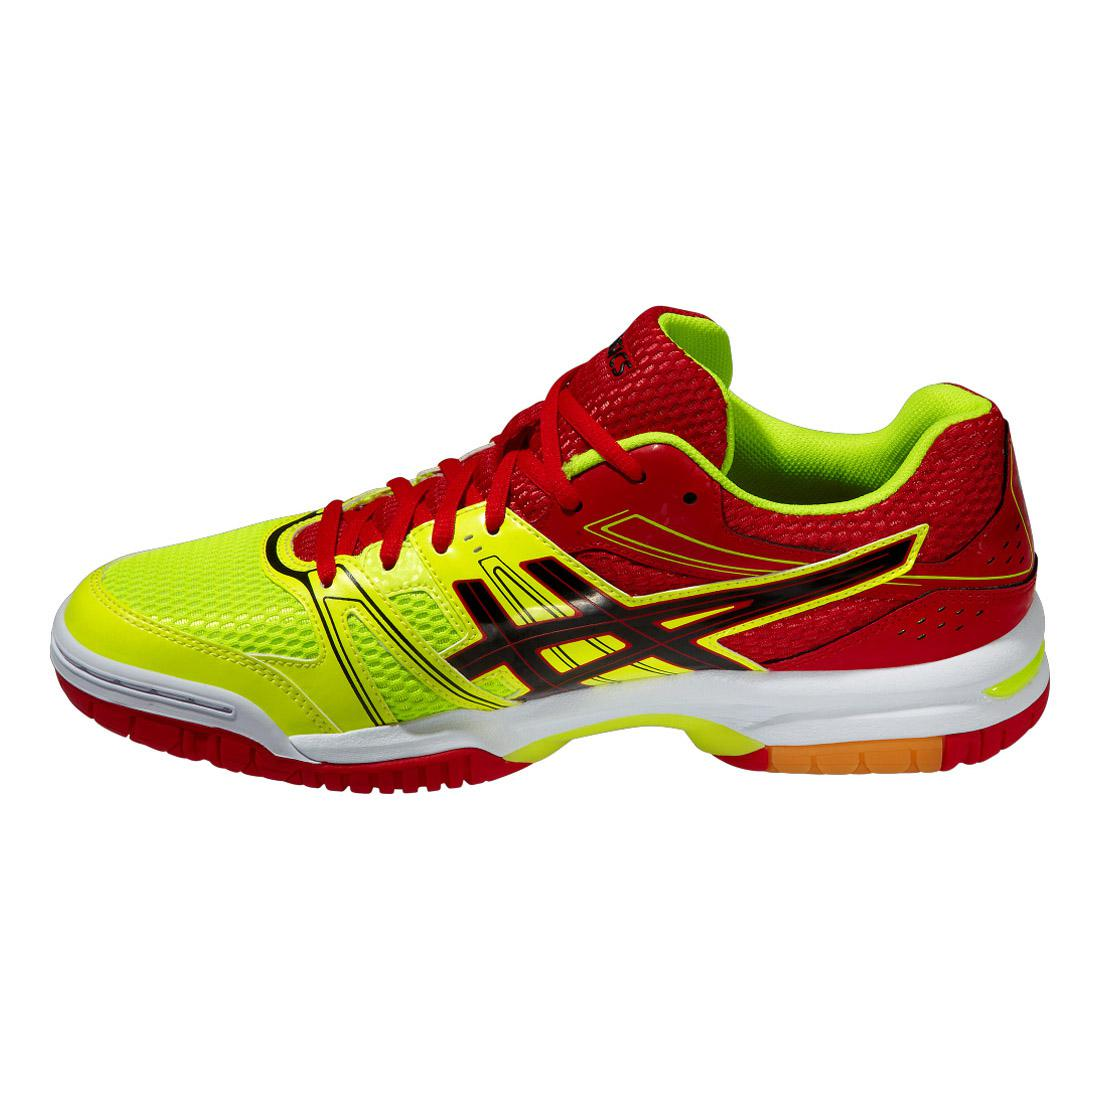 Asics Mens GEL Rocket 7 Indoor Court Shoes - Yellow/Red